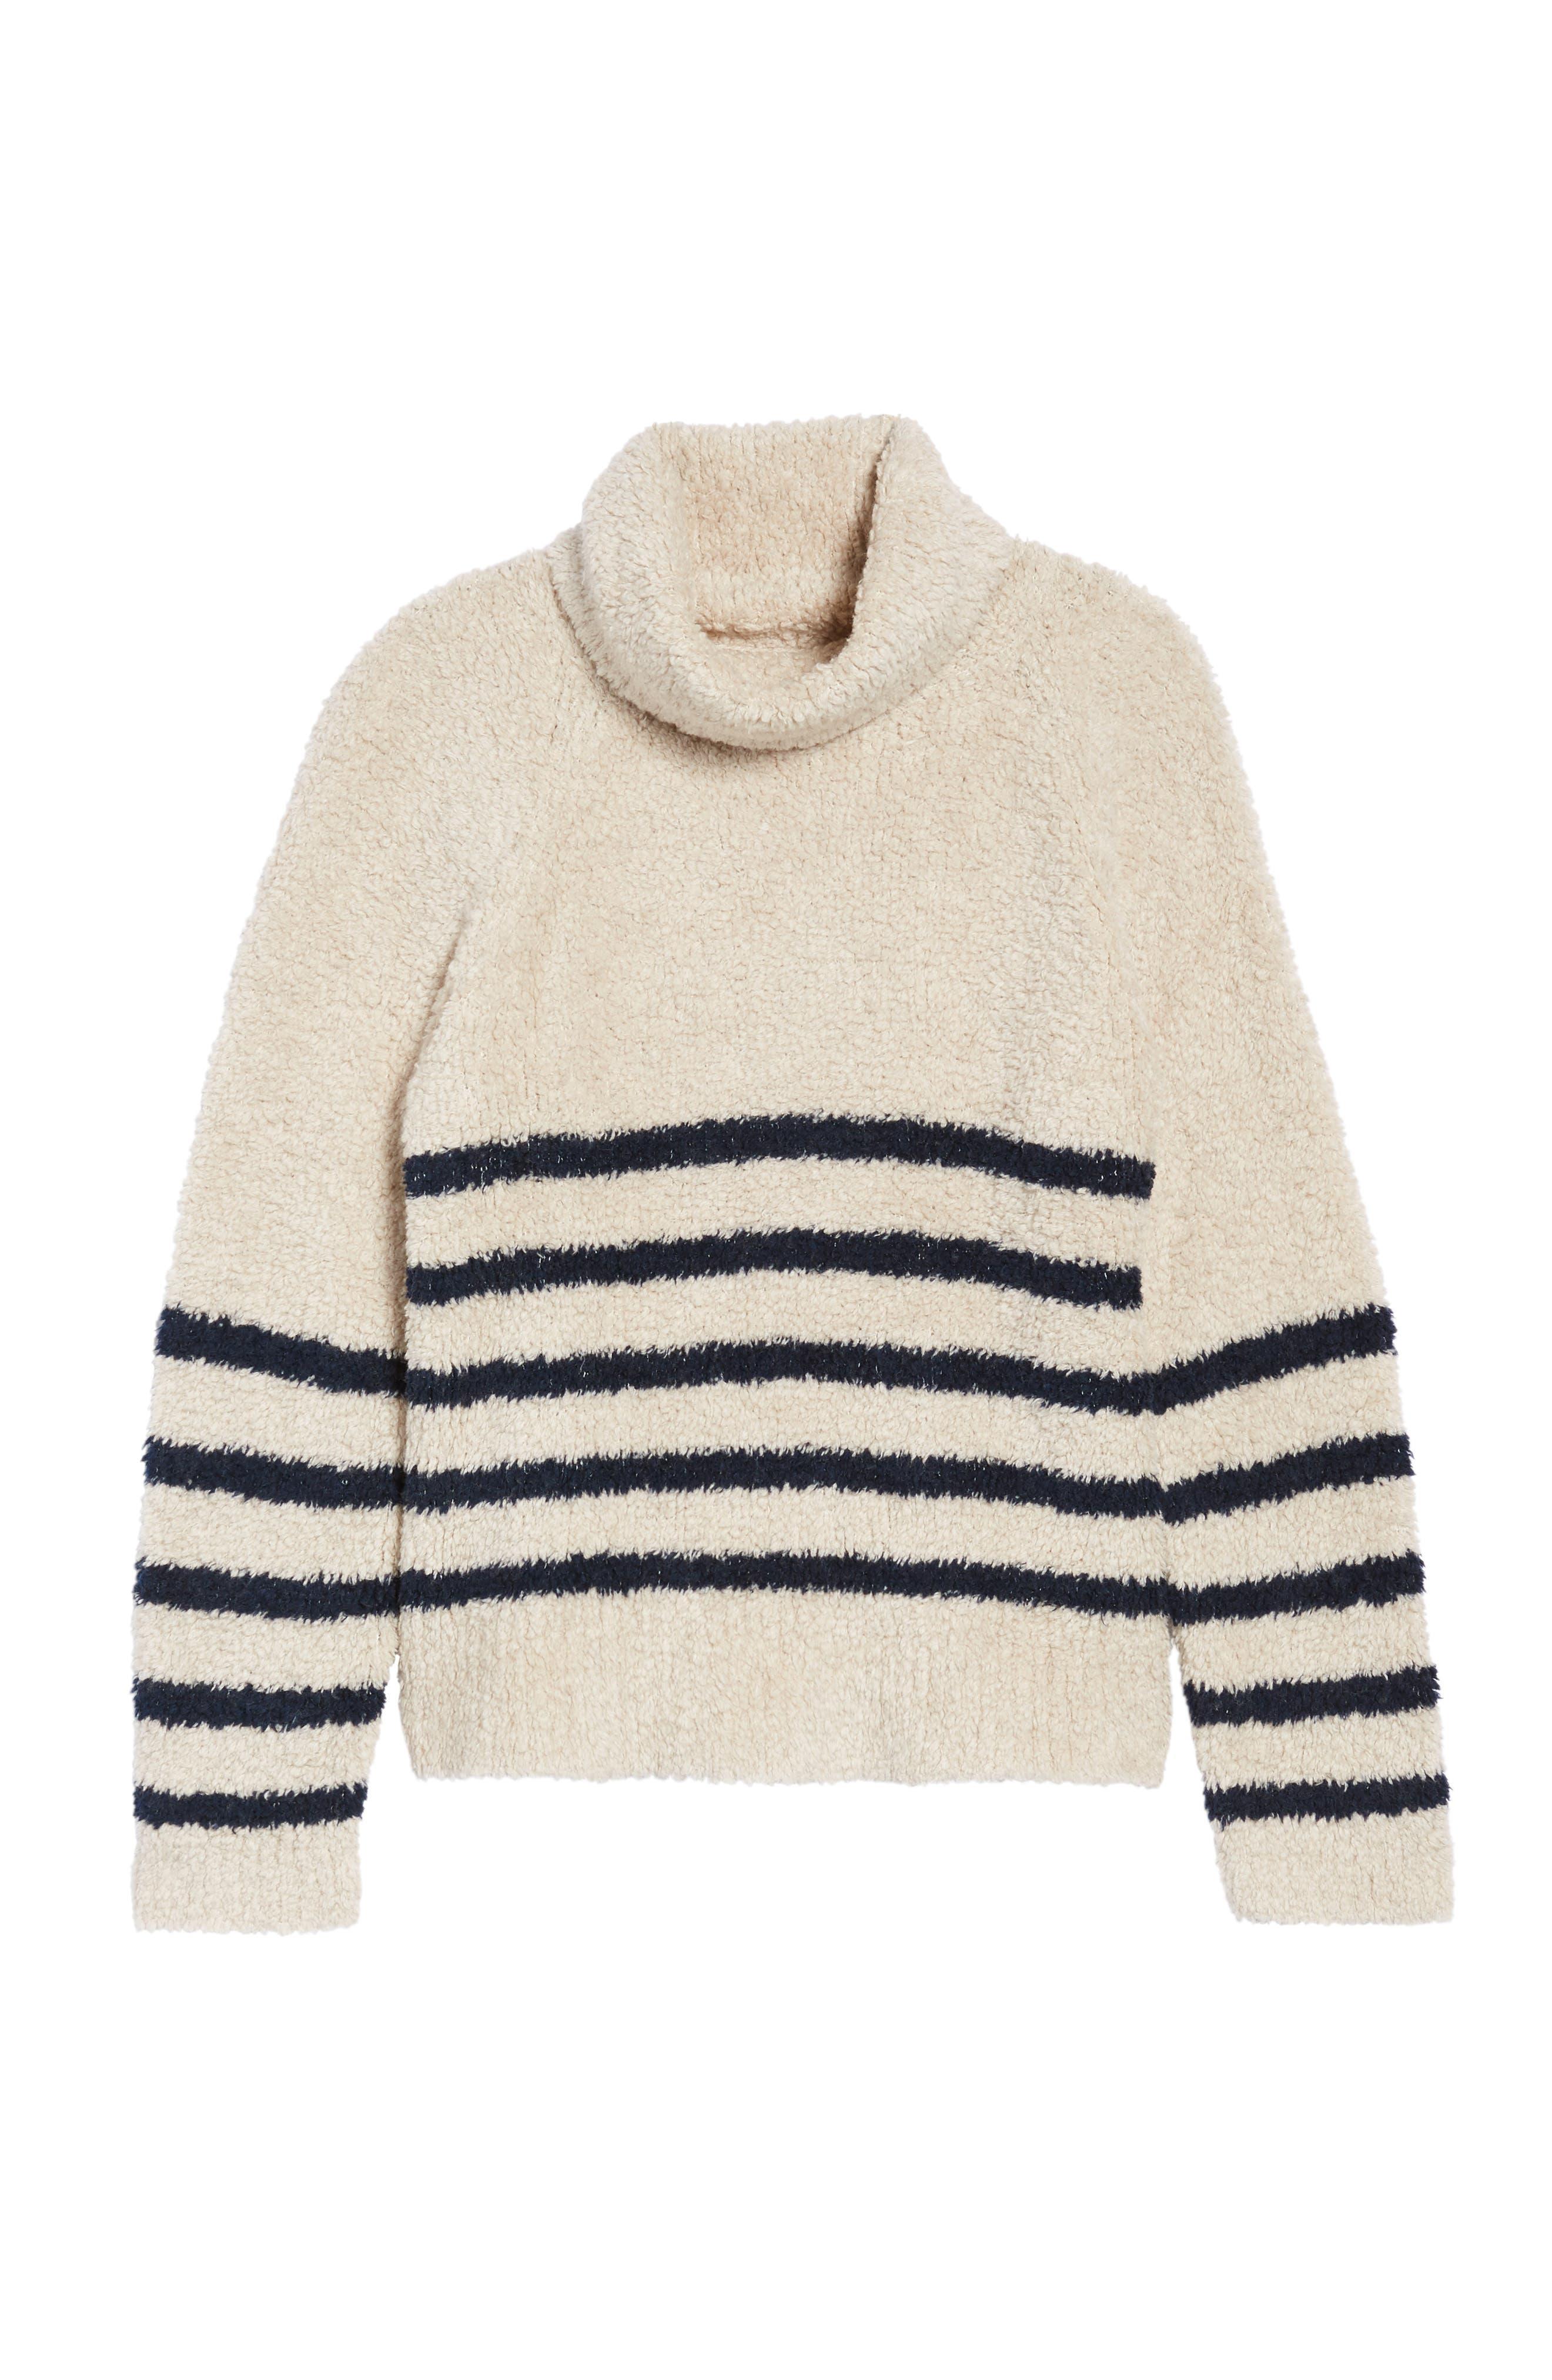 Mariner Stripe Turtleneck Sweater,                             Alternate thumbnail 6, color,                             090